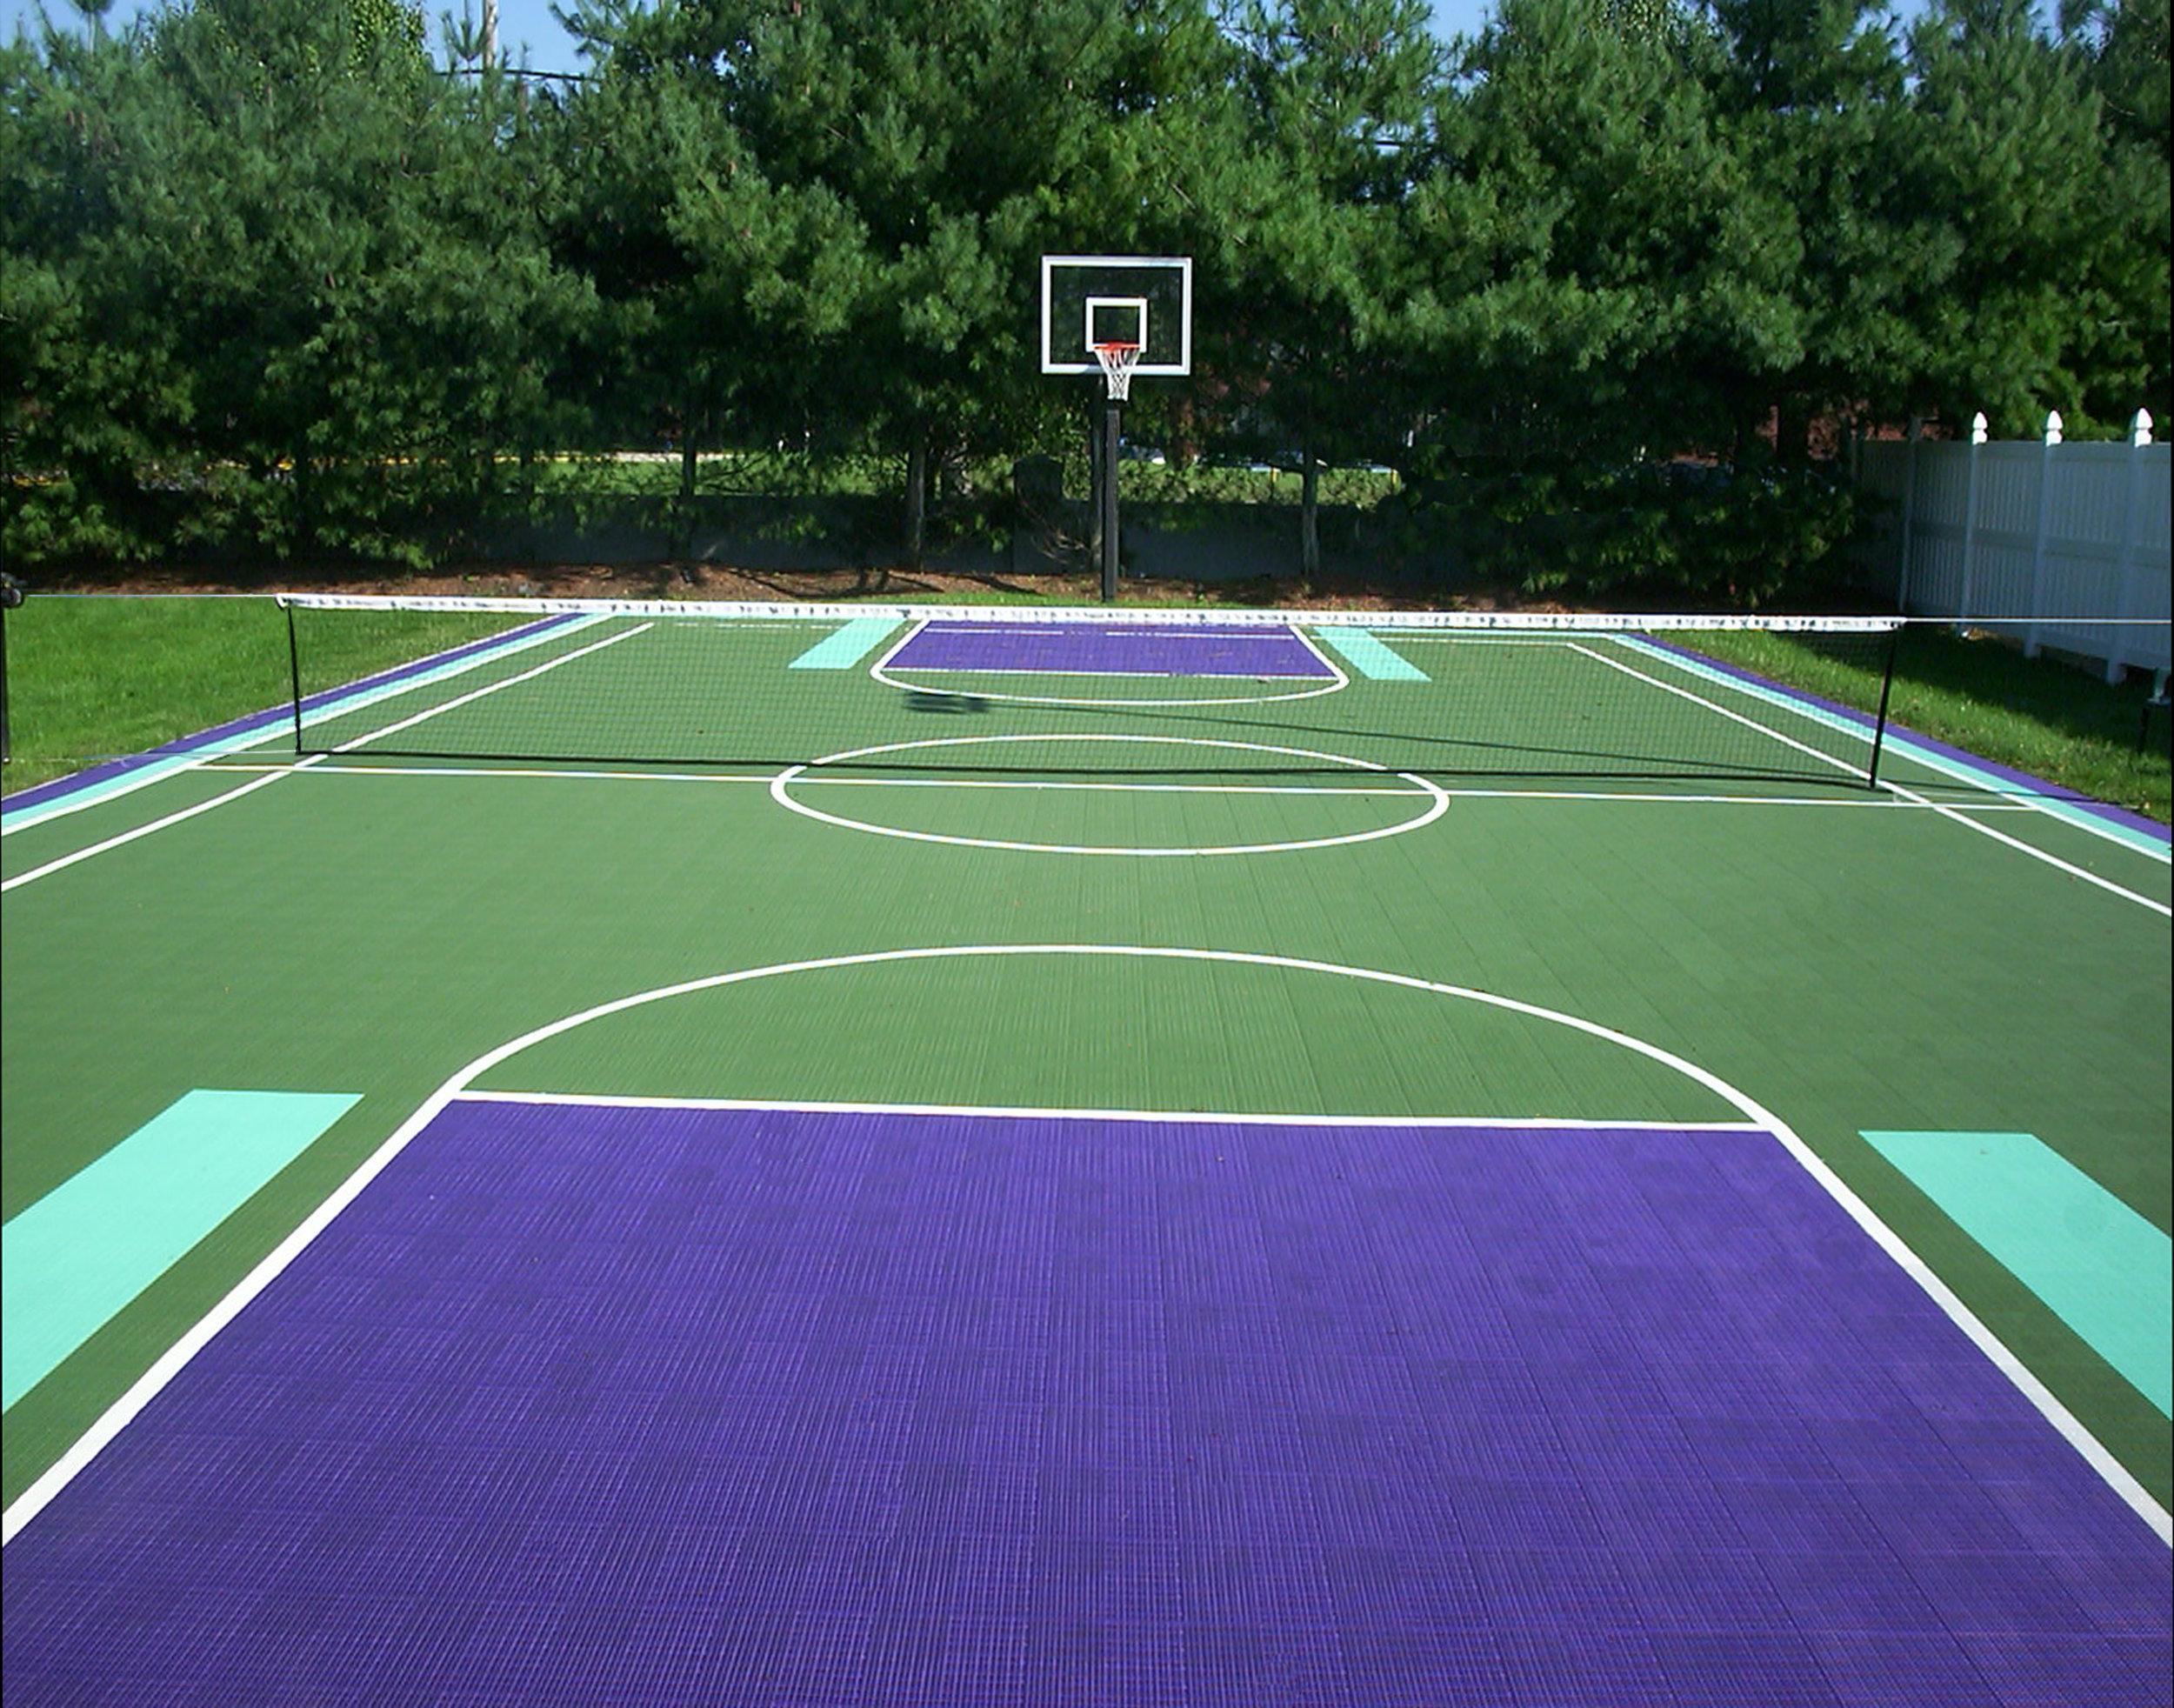 Basketball court installation company in Long Island, NY